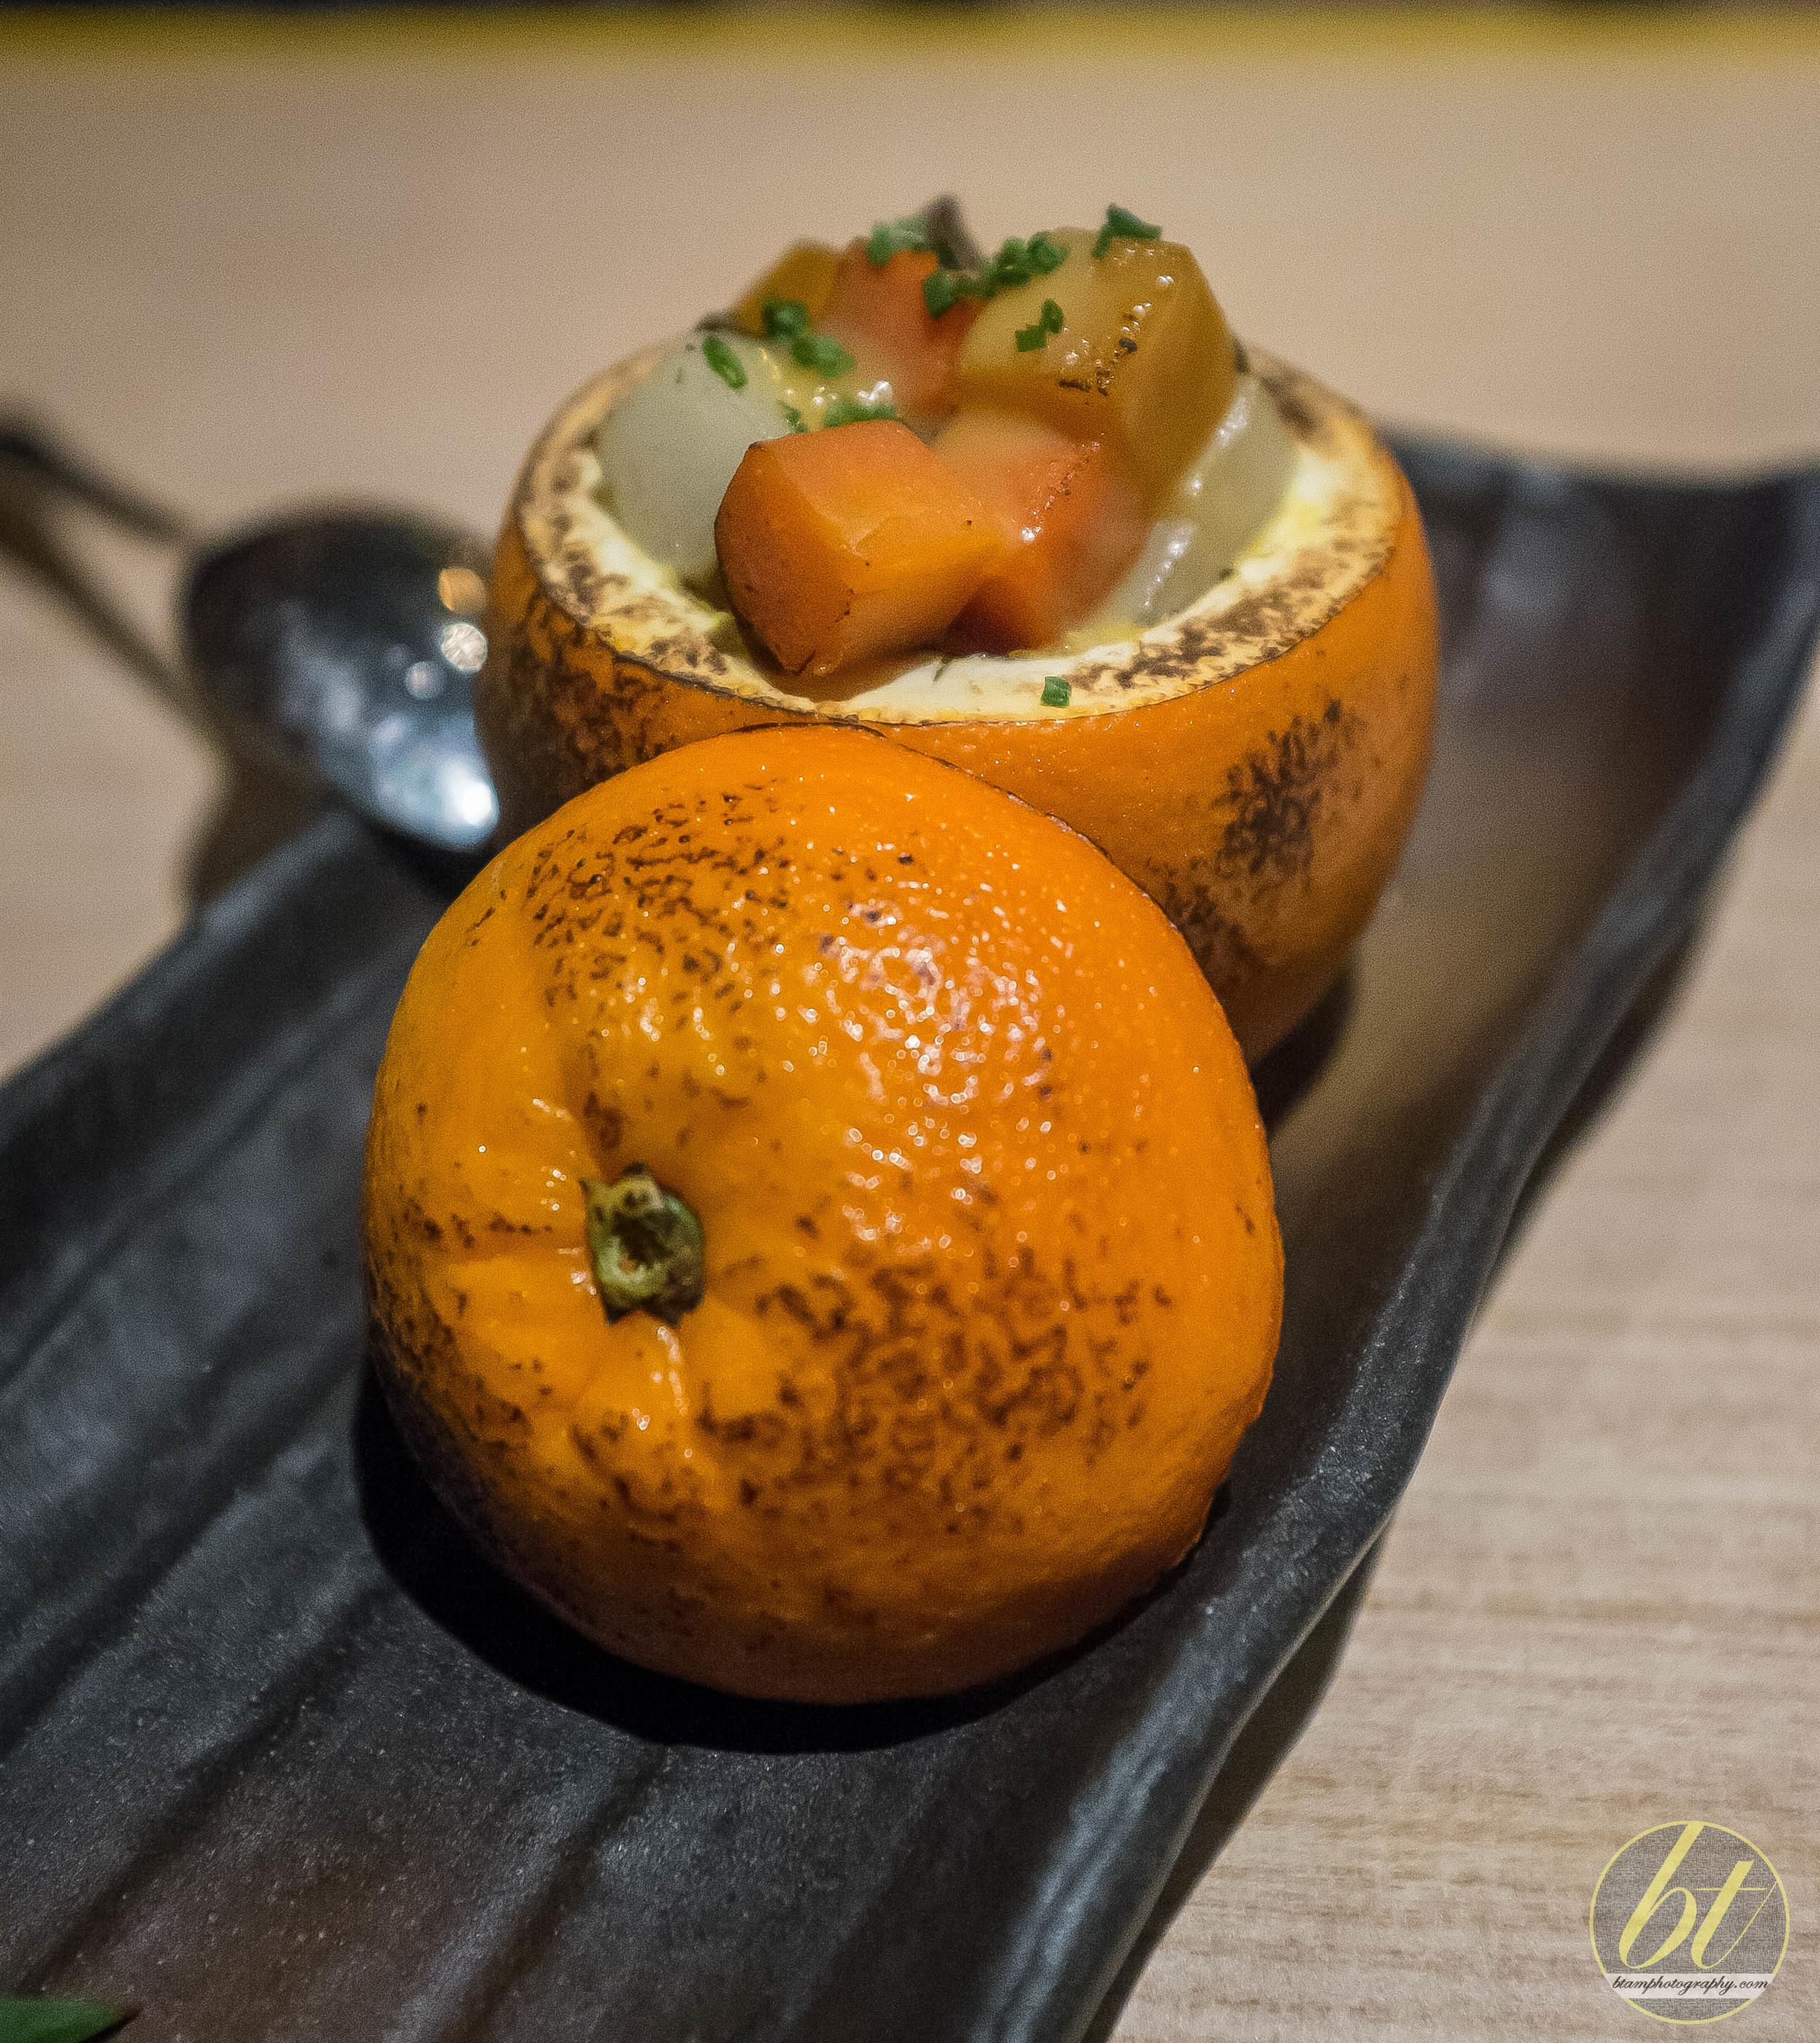 Roast Umami Vegetables with Orange Miso and Orange Pot